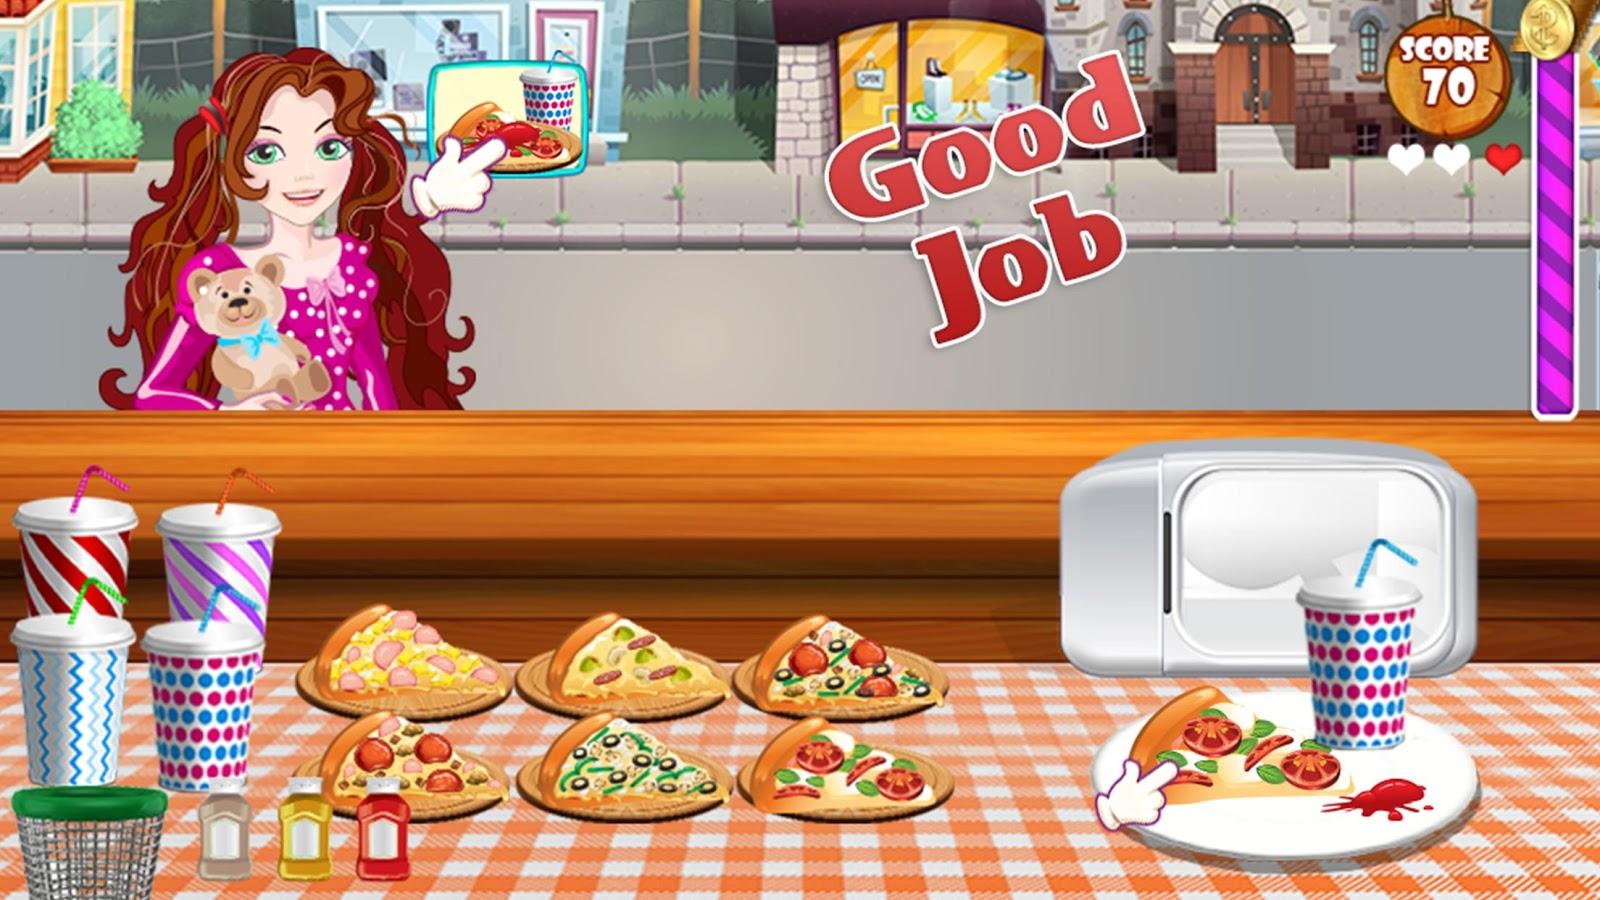 kitchen game coffee rugs for 比萨争夺 厨房游戏好玩吗 厨房游戏游戏介绍 厨房